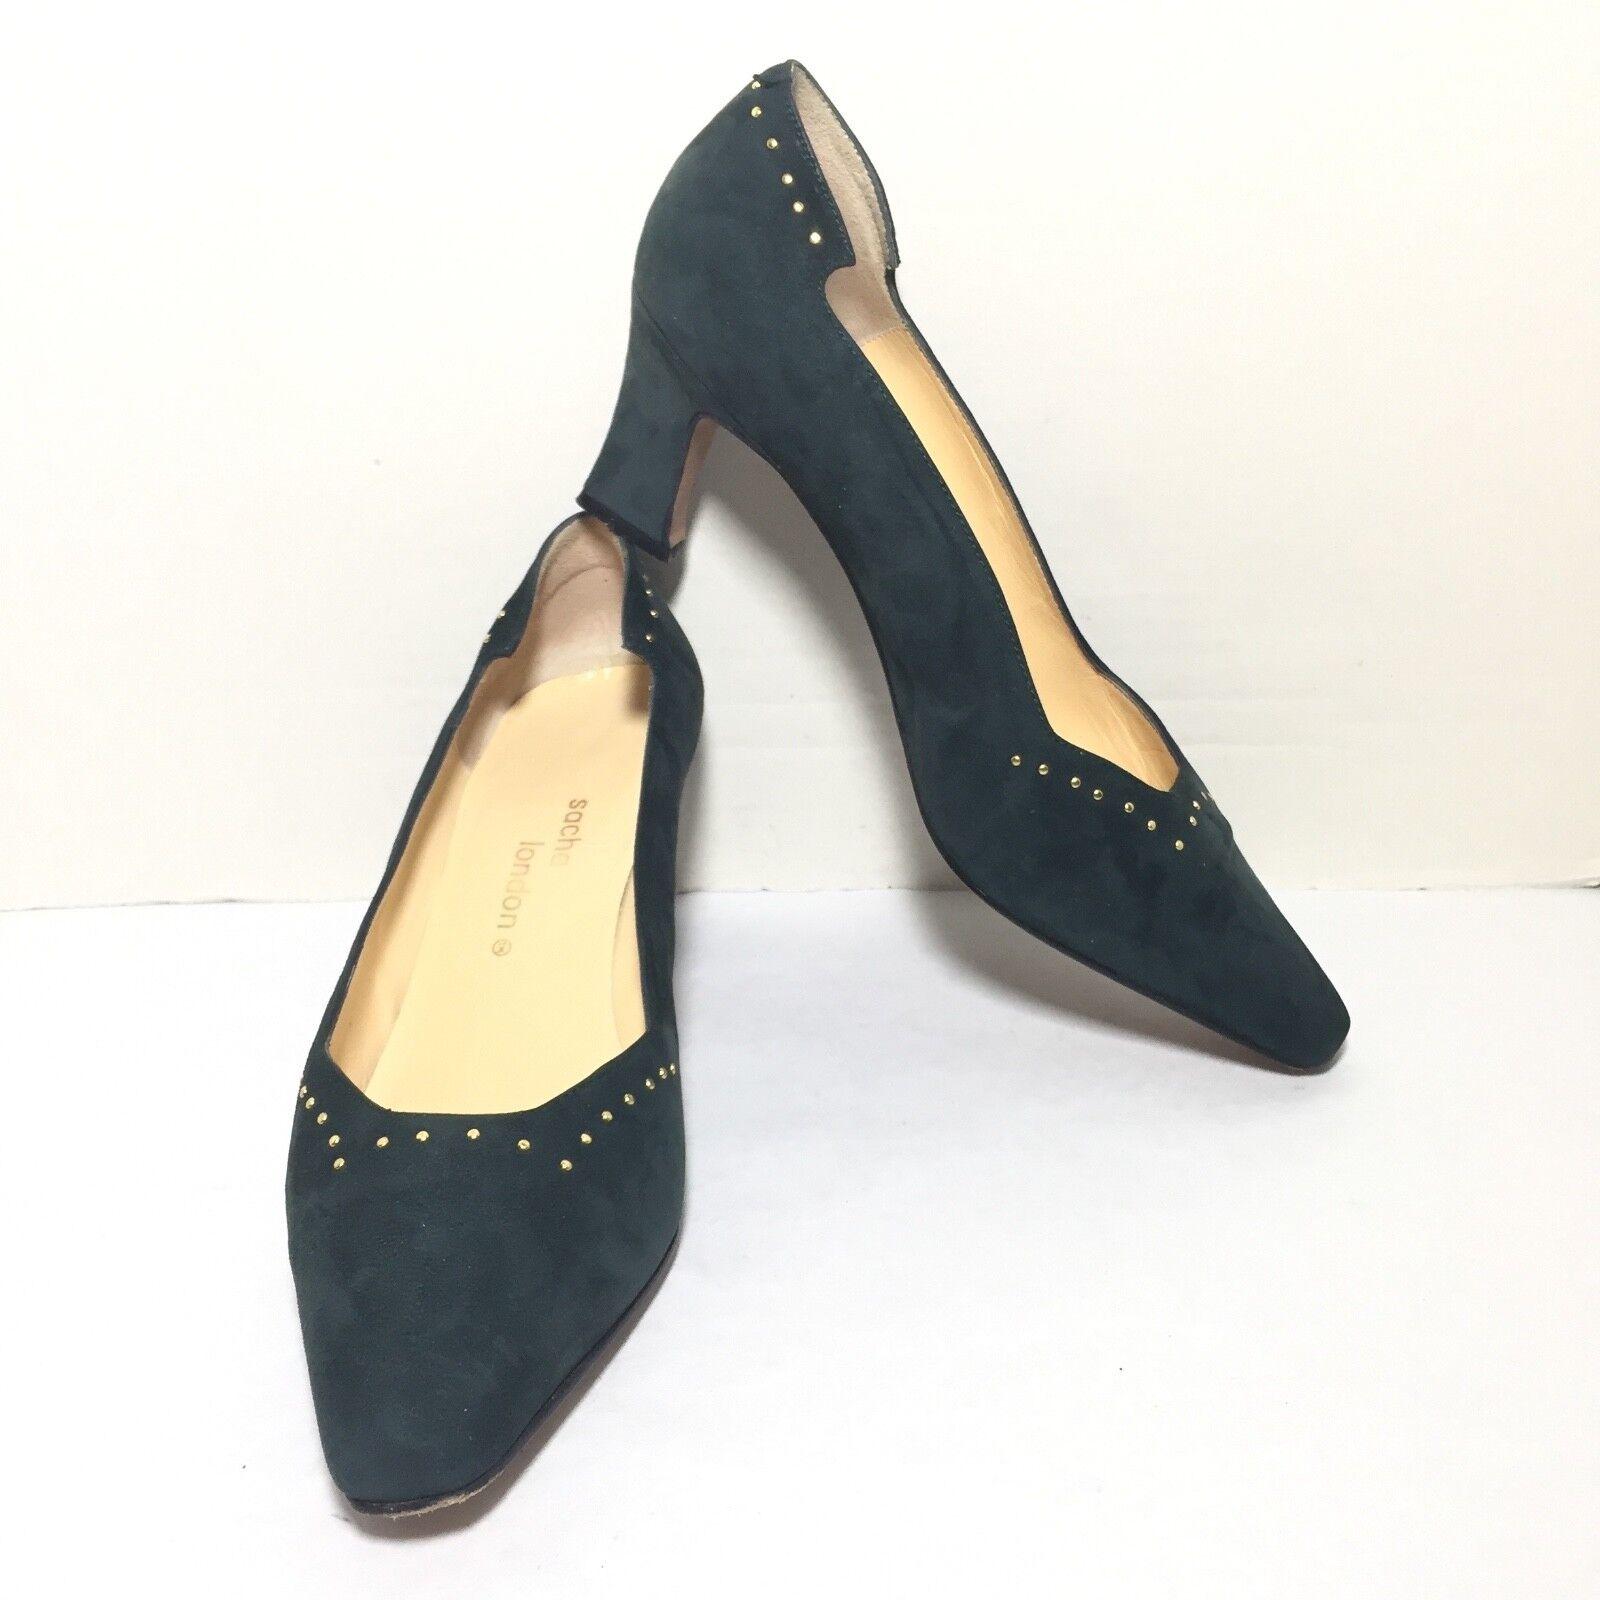 SACHA LONDON Women's Black Studded Suede Medium Heel Pumps Size 7 B